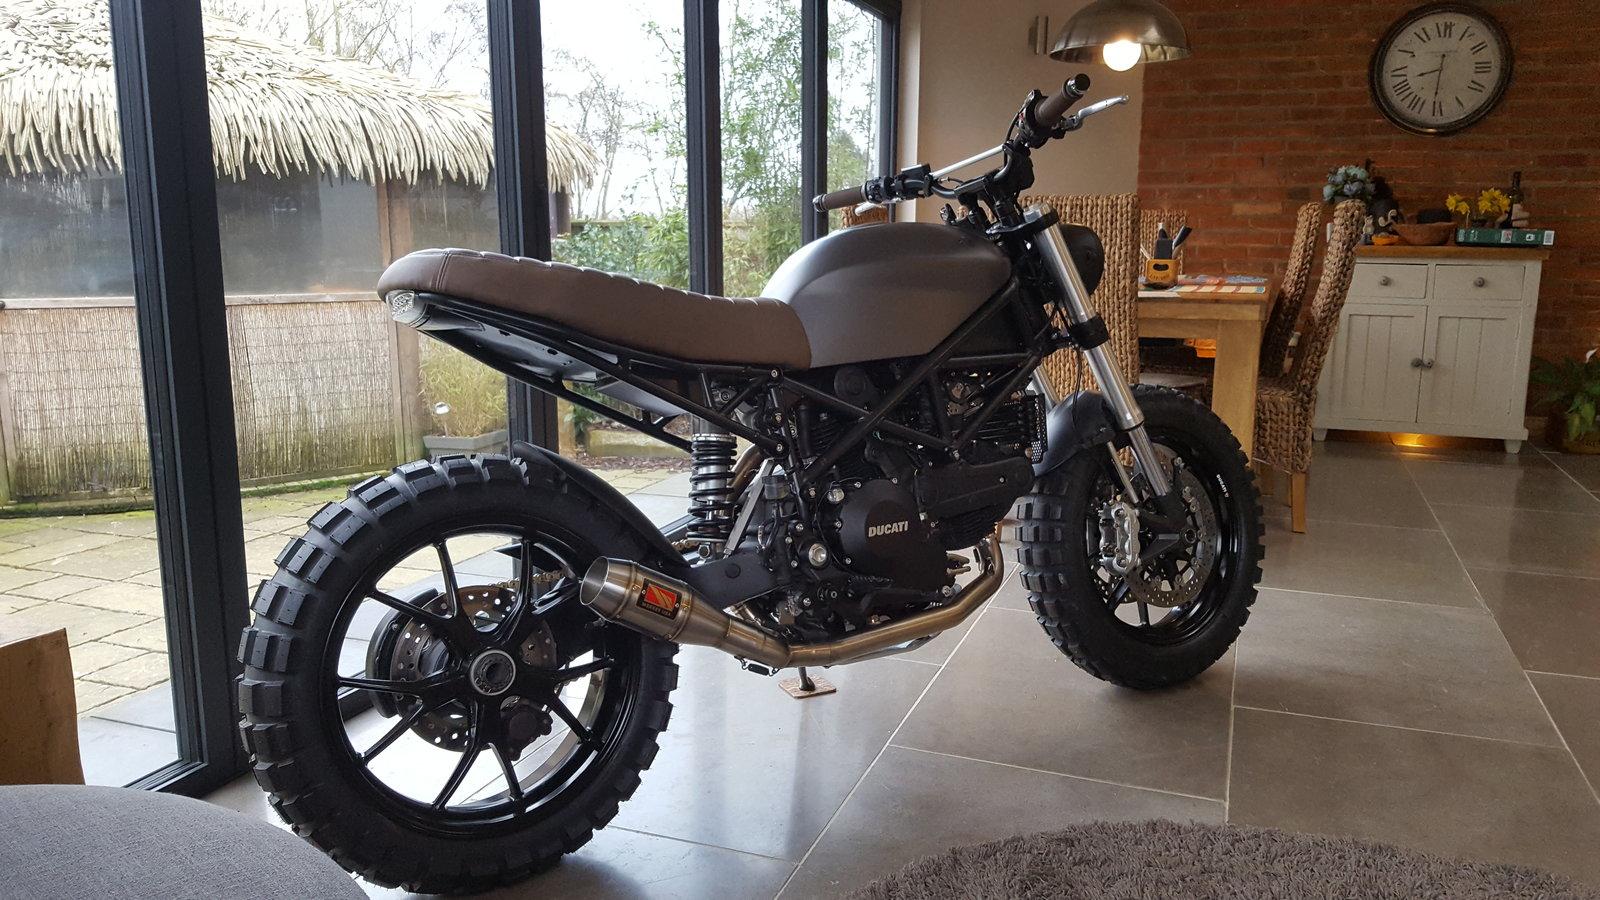 Hypermotard Gallery | Page 26 | Ducati Forum